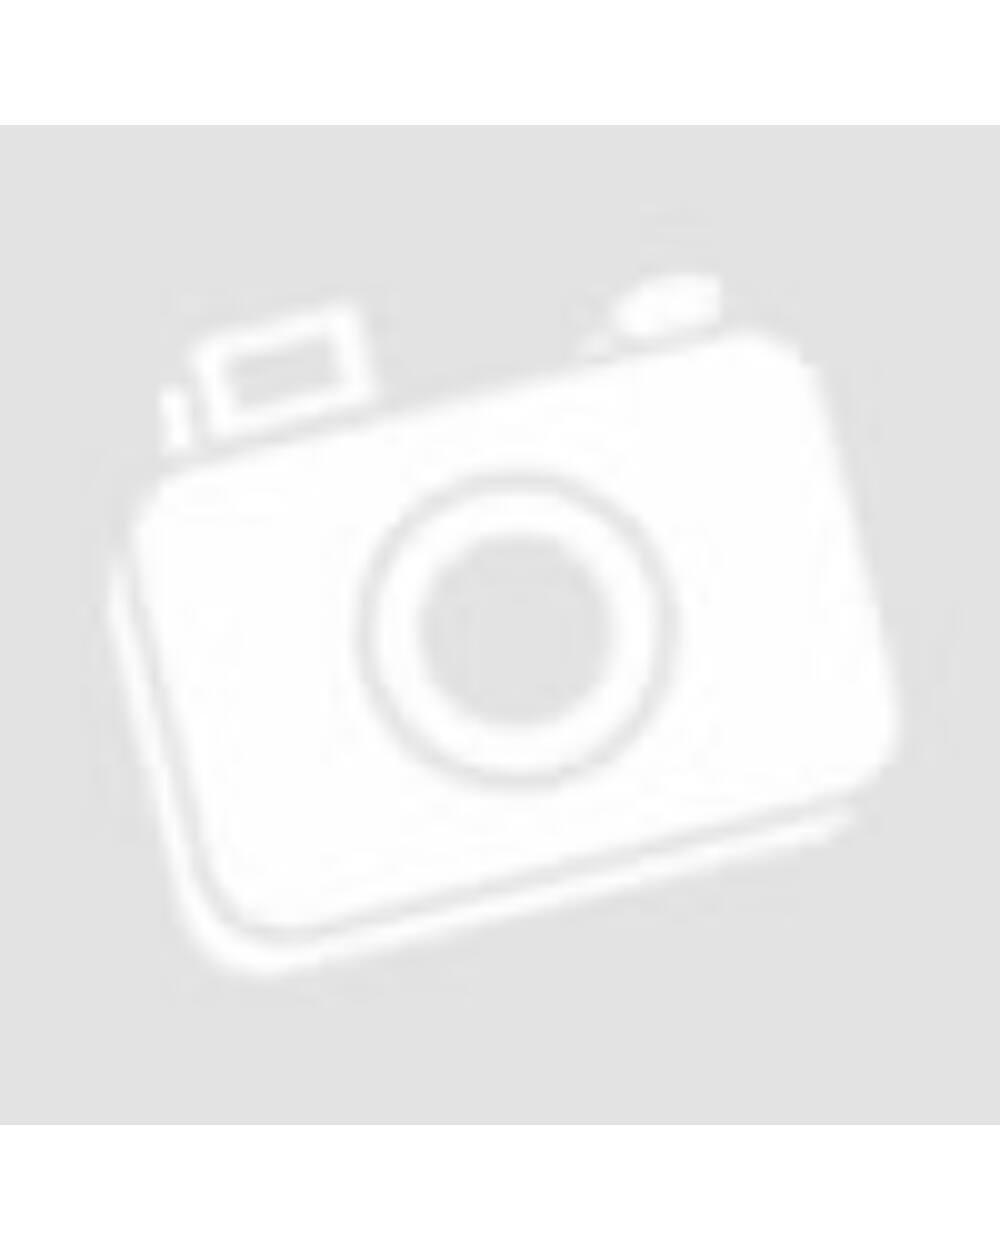 Casco Activ 2U white bukósisak, 58-62 cm